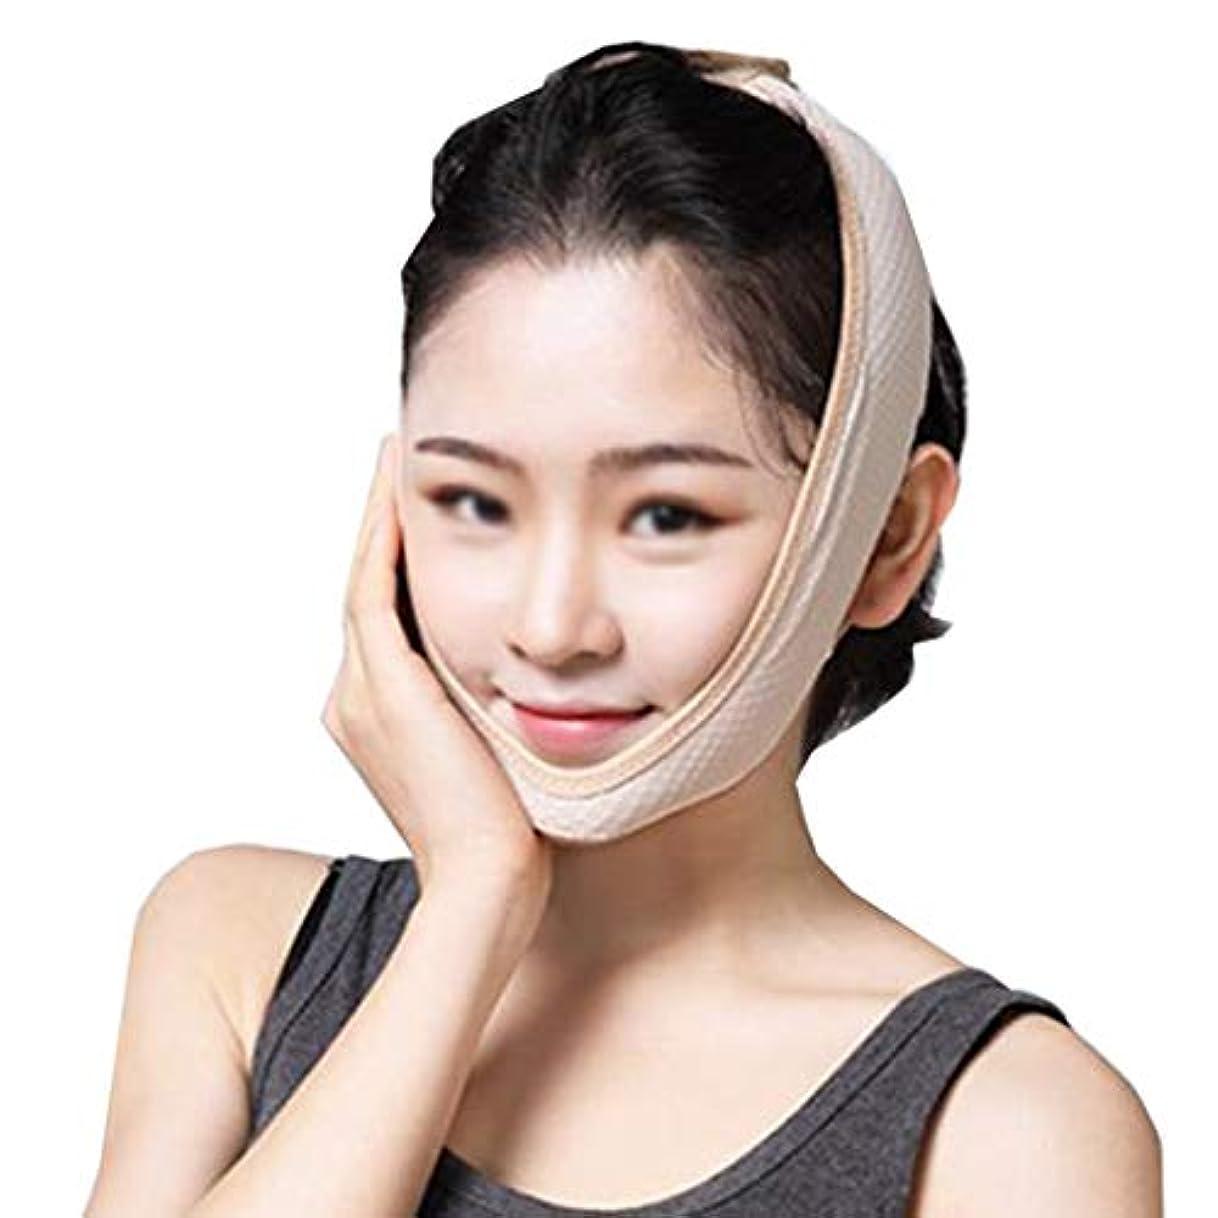 ZWBD フェイスマスク, 薄い顔アーティファクト小さなV字型顔引き締めリフティングフェイスリフト薄いダブルチン男性と女性の包帯マスク滴下ビーズマスク